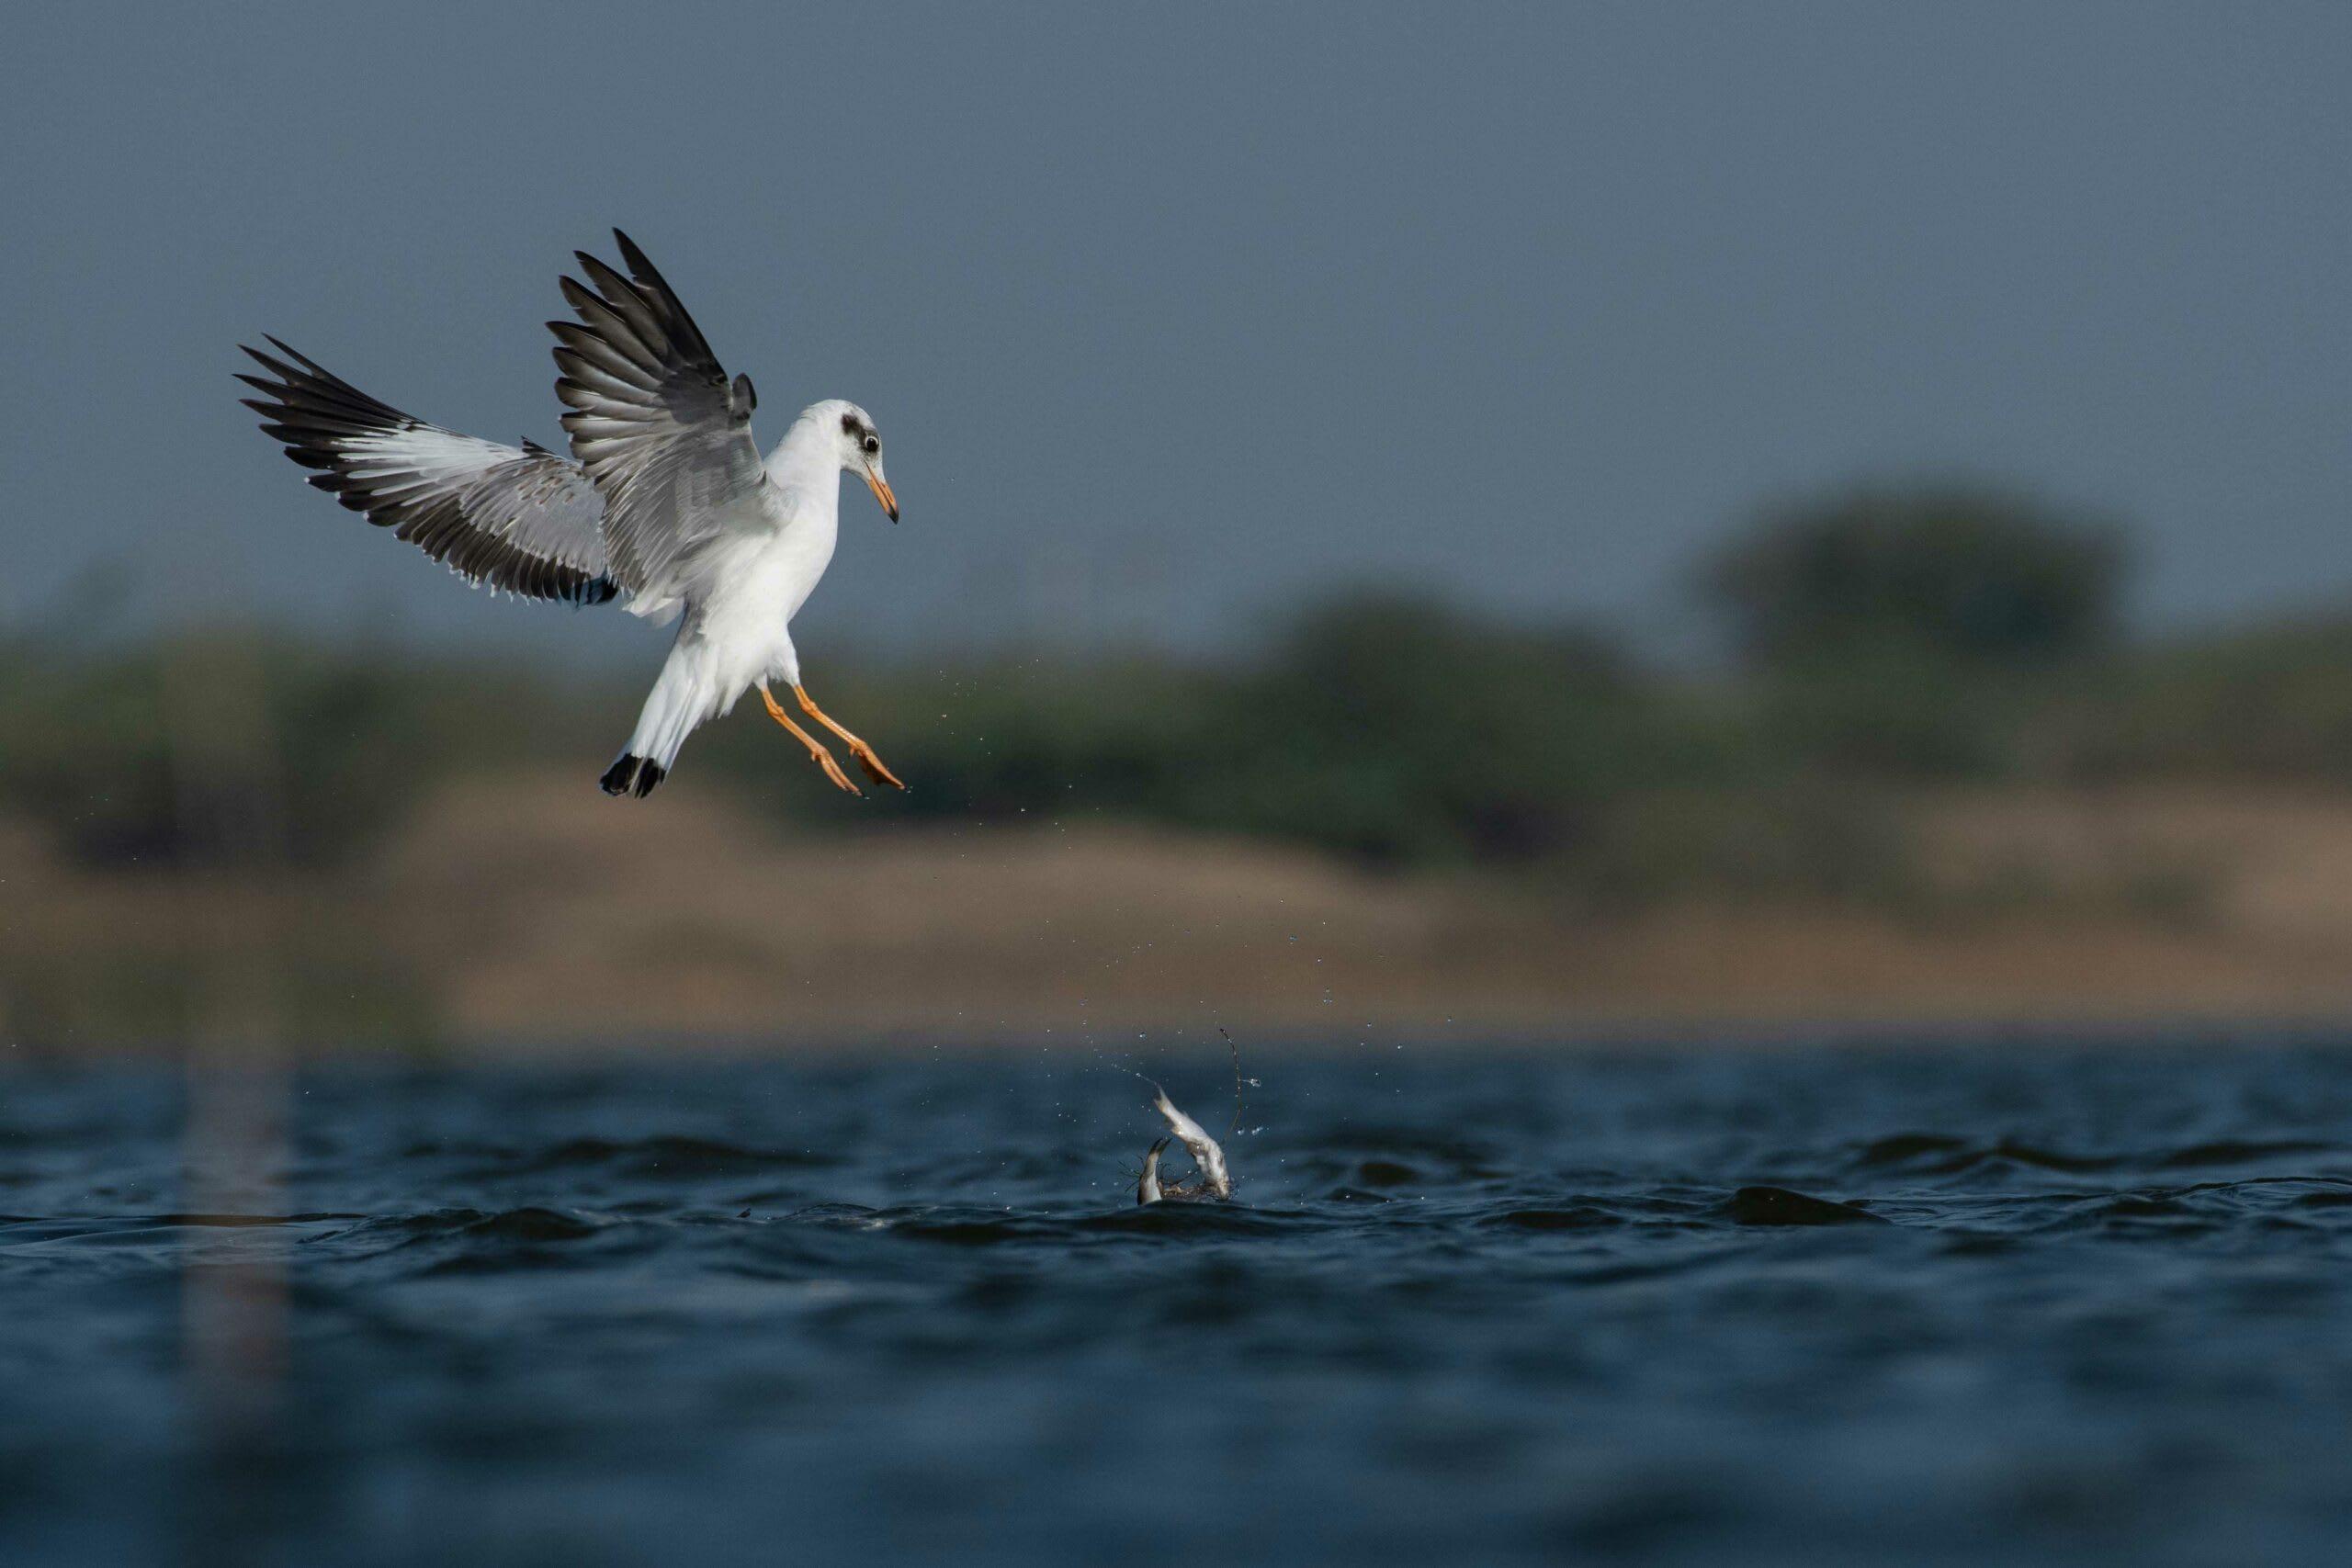 gujarat-jamnagar-brown-headed-gull-feeding-two-fish